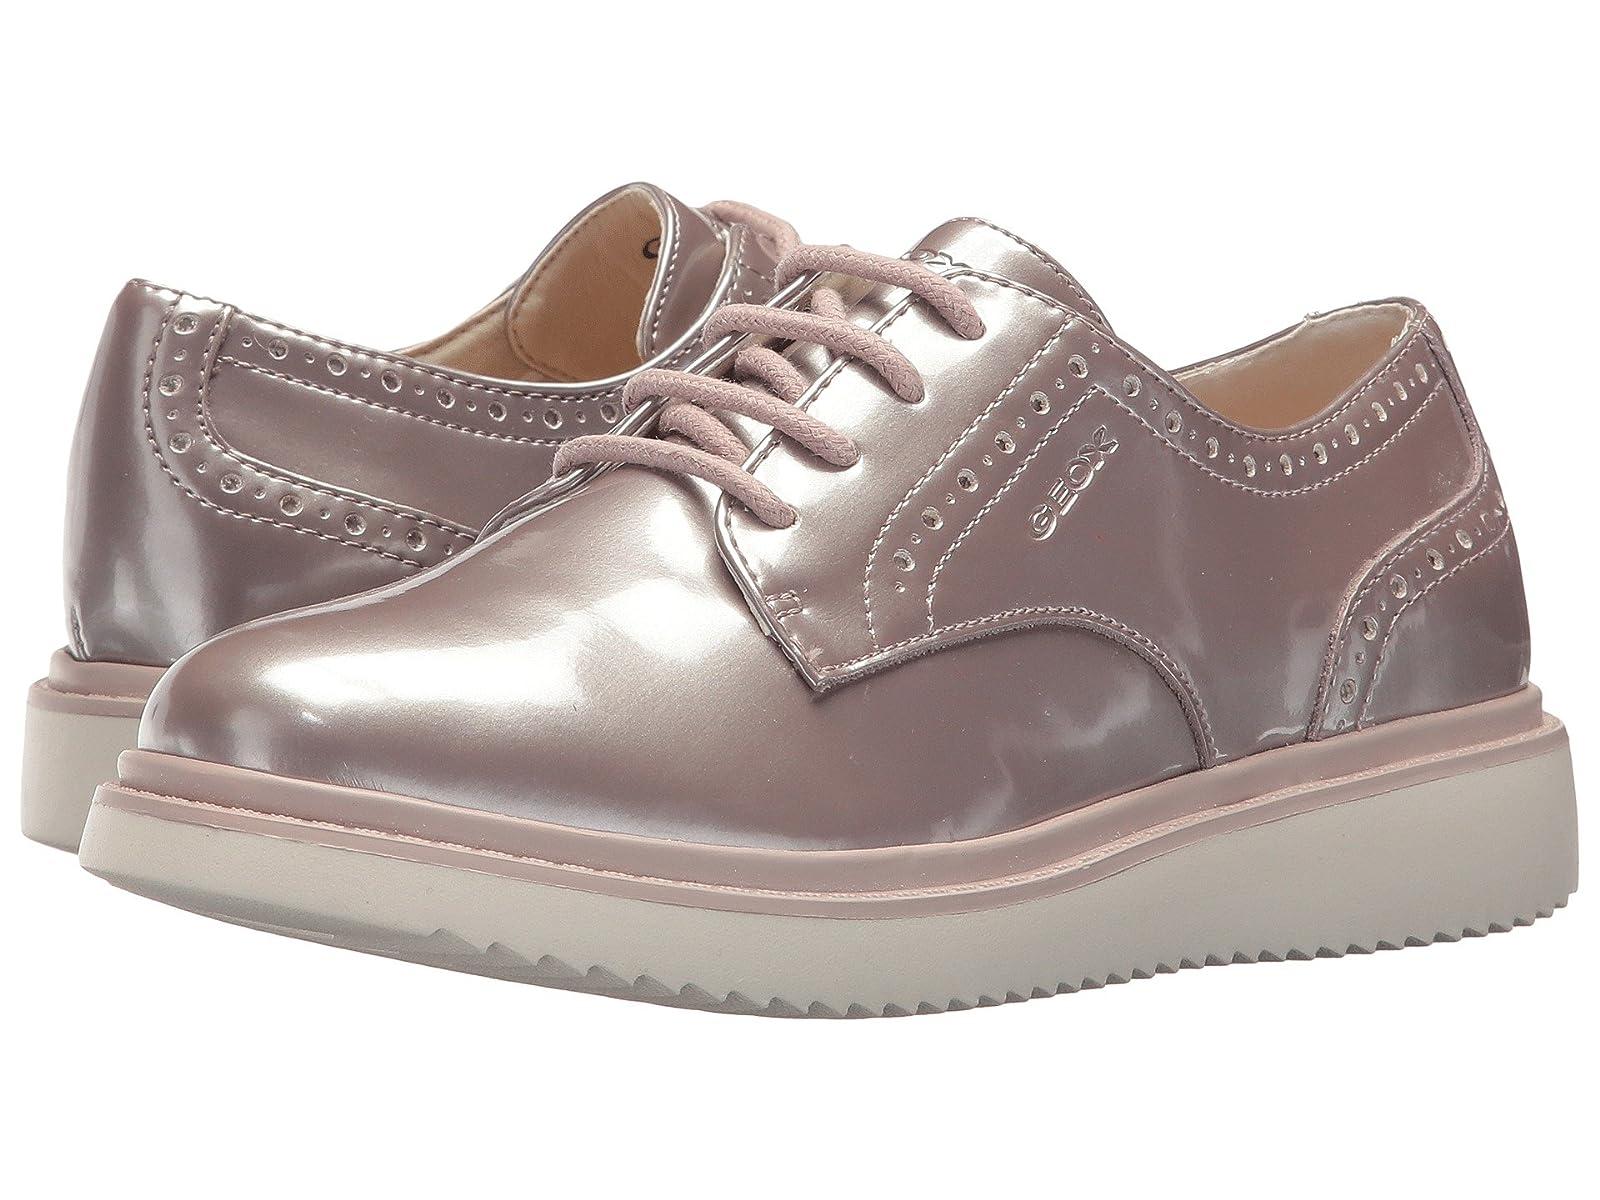 Geox Kids Thymar 5 (Little Kid/Big Kid)Cheap and distinctive eye-catching shoes